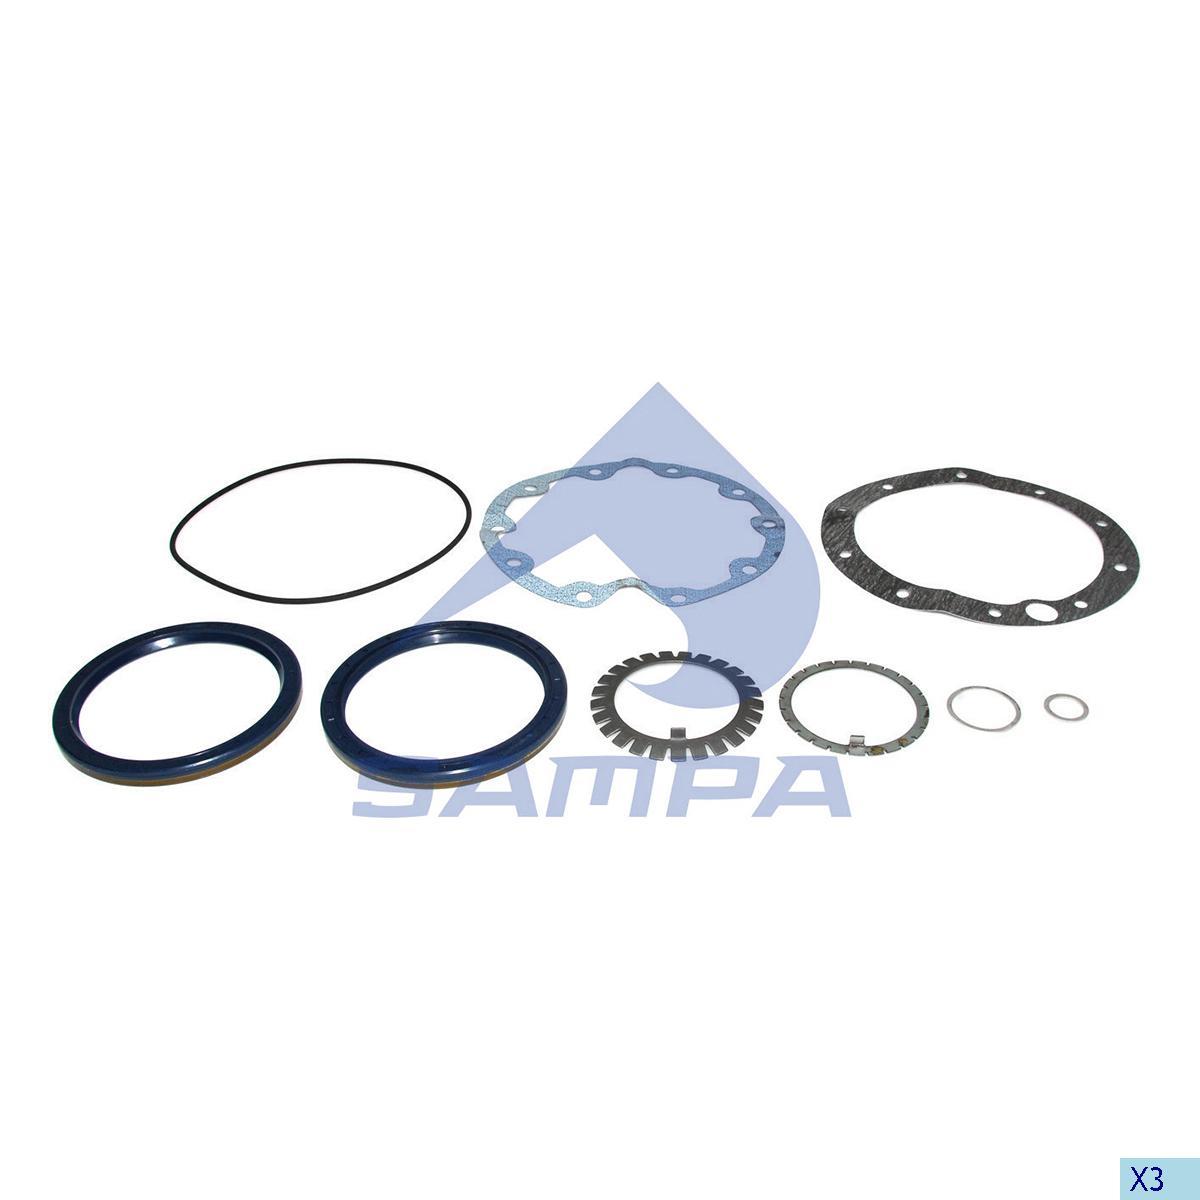 Repair Kit, Wheel Hub, Mercedes, Power Unit